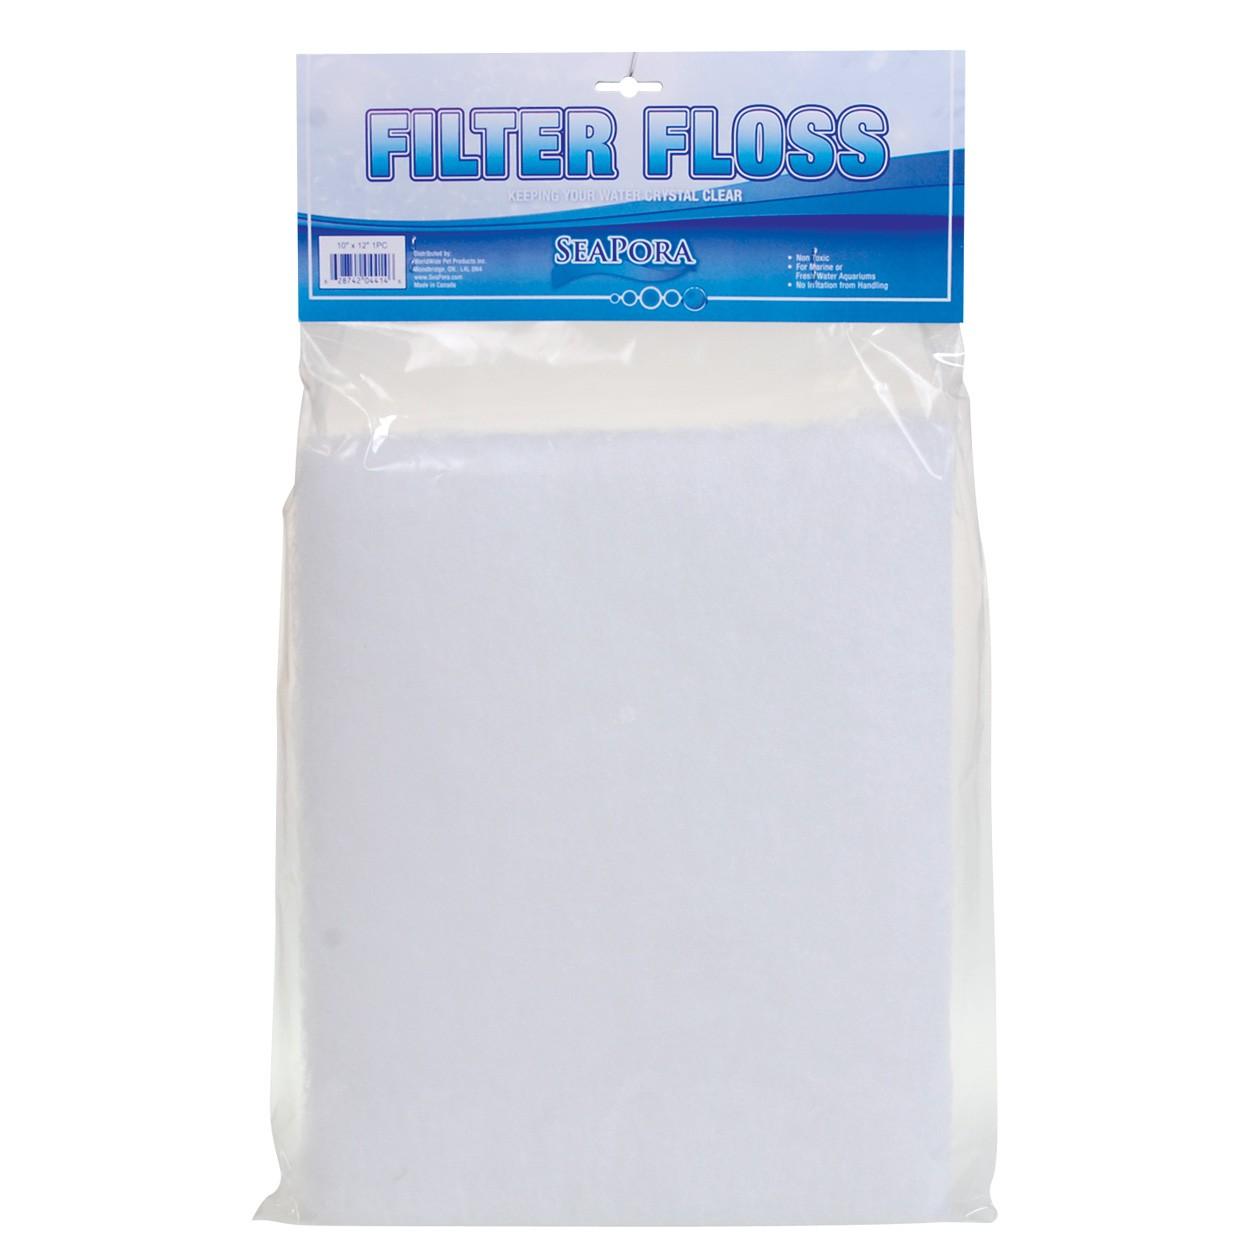 "SeaPora Filter Floss Pad - 10"" x 12"" - 1 pk"